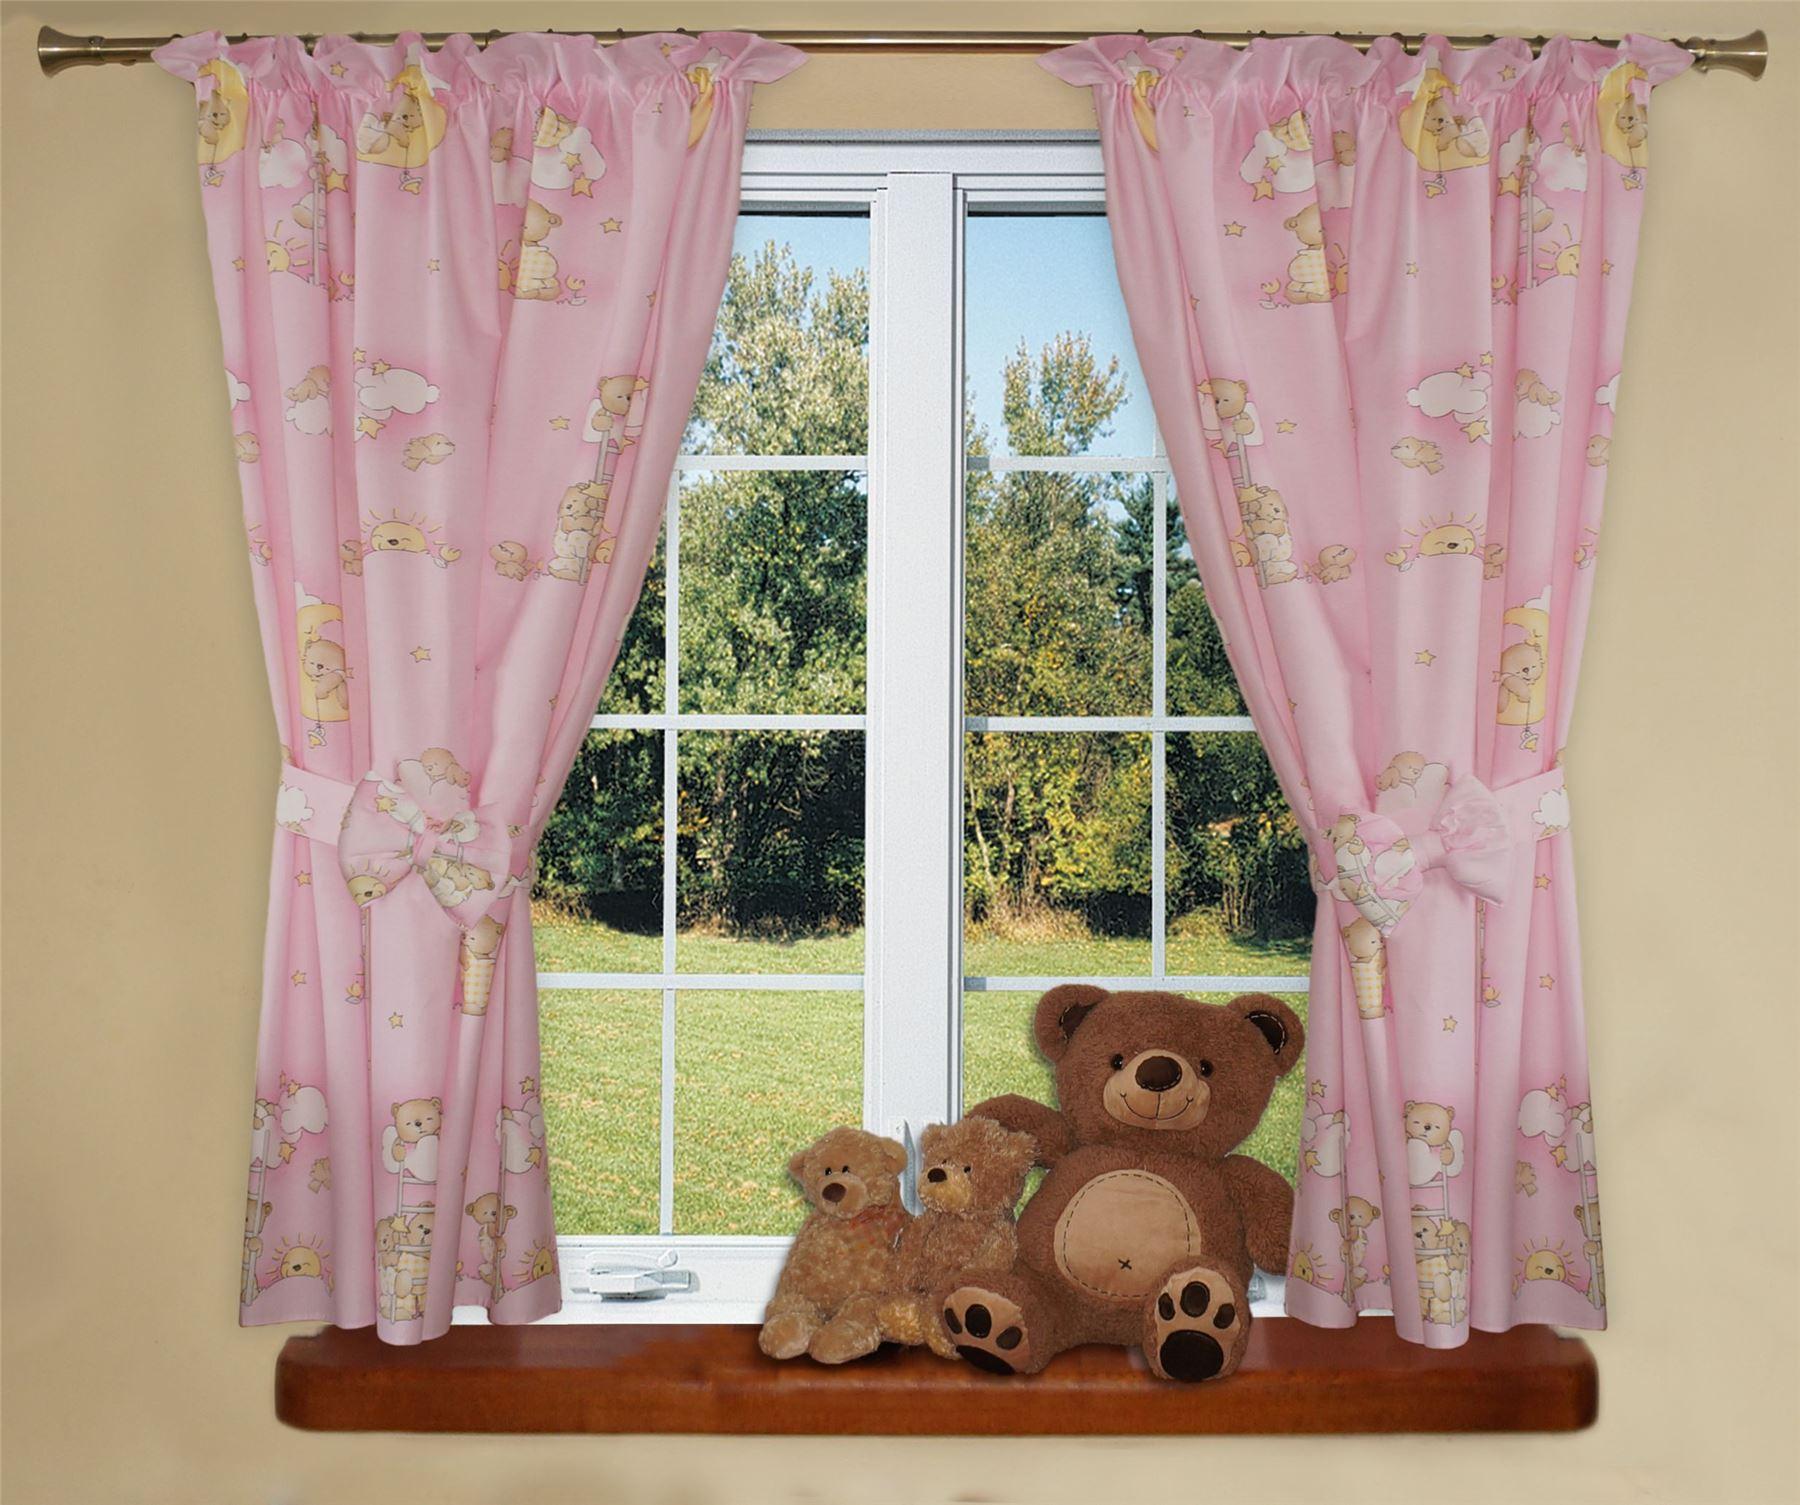 luxuri s baby zimmer fenster vorh nge in passend muster. Black Bedroom Furniture Sets. Home Design Ideas